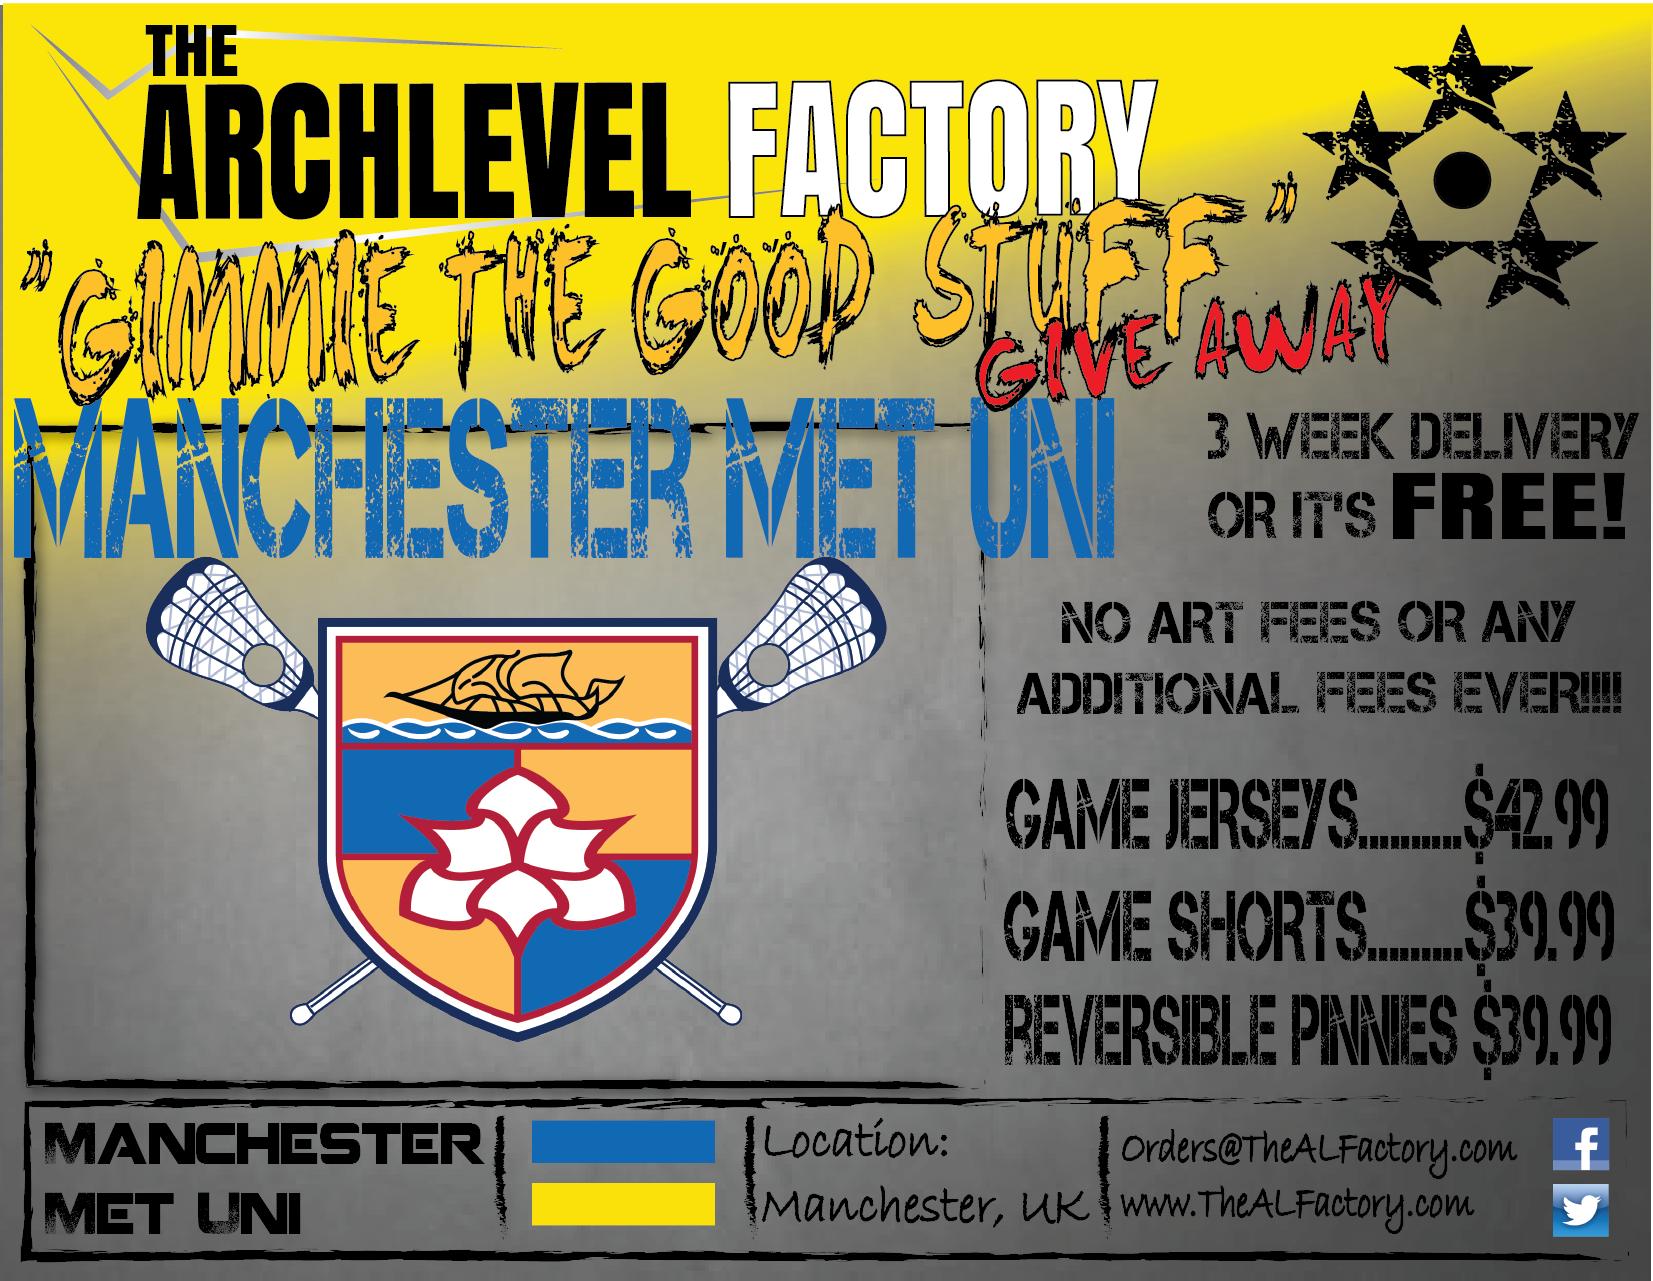 Manchester Met Uni